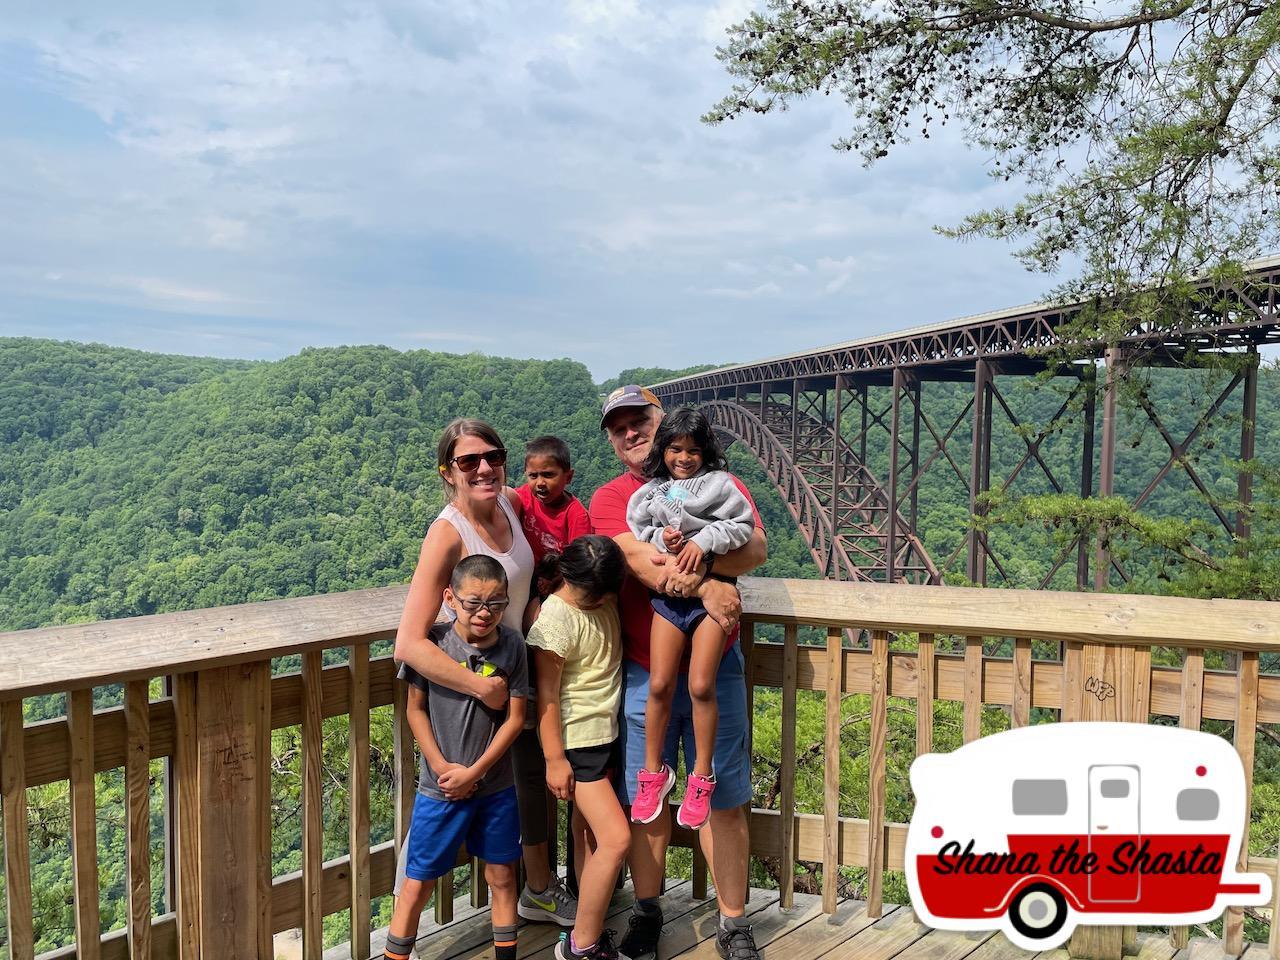 Family-at-New-River-Gorge-Bridge